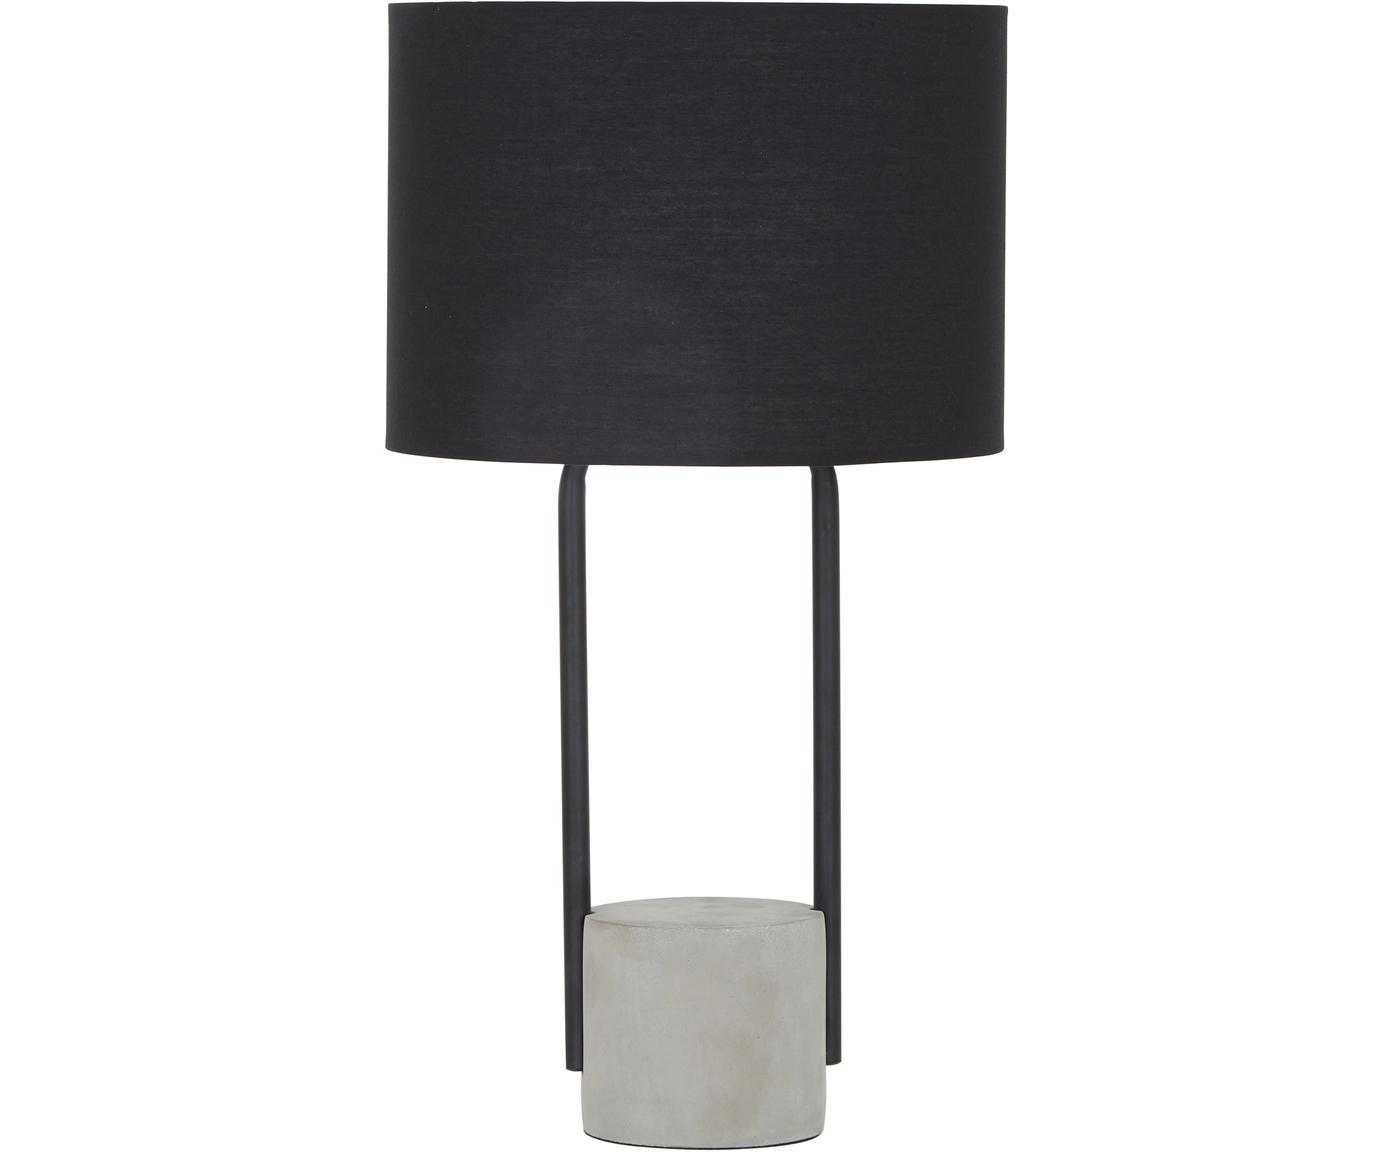 Lámpara de mesa Pipero, Pantalla: tela, Cable: cubierto en tela, Negro, gris, Ø 28 x Al 51 cm